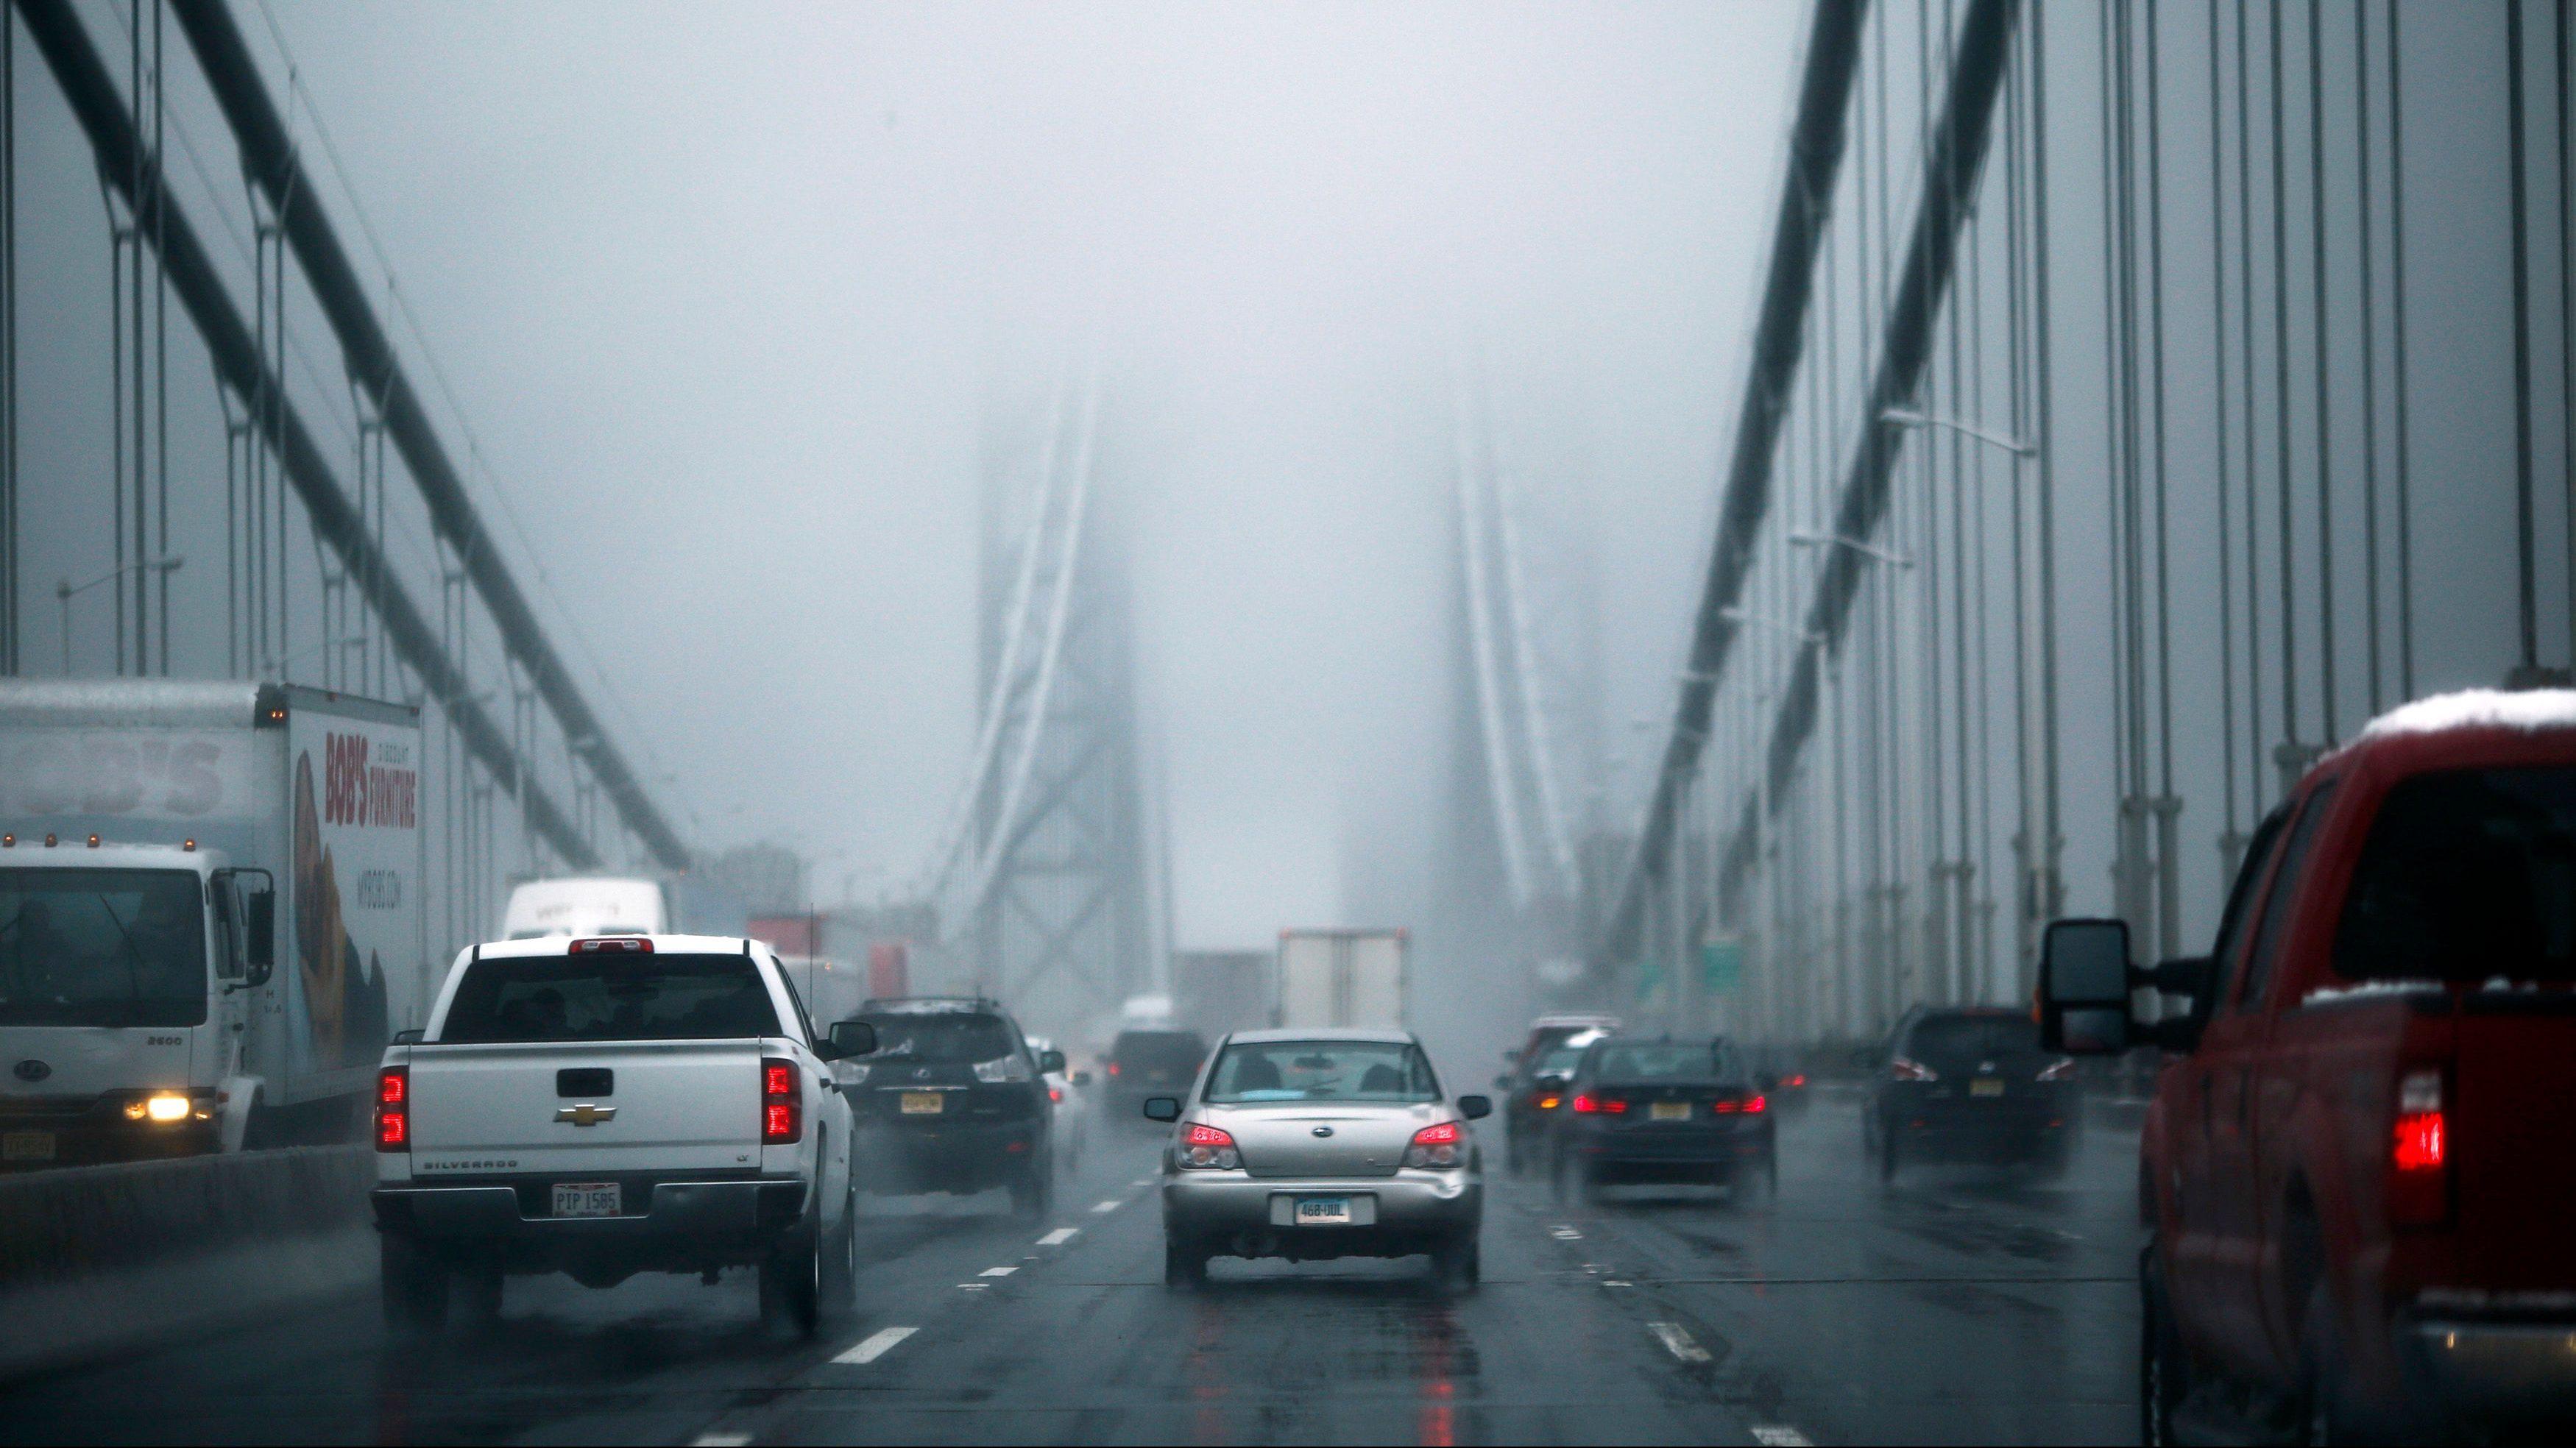 Cars make their way through the Washington bridge in New York